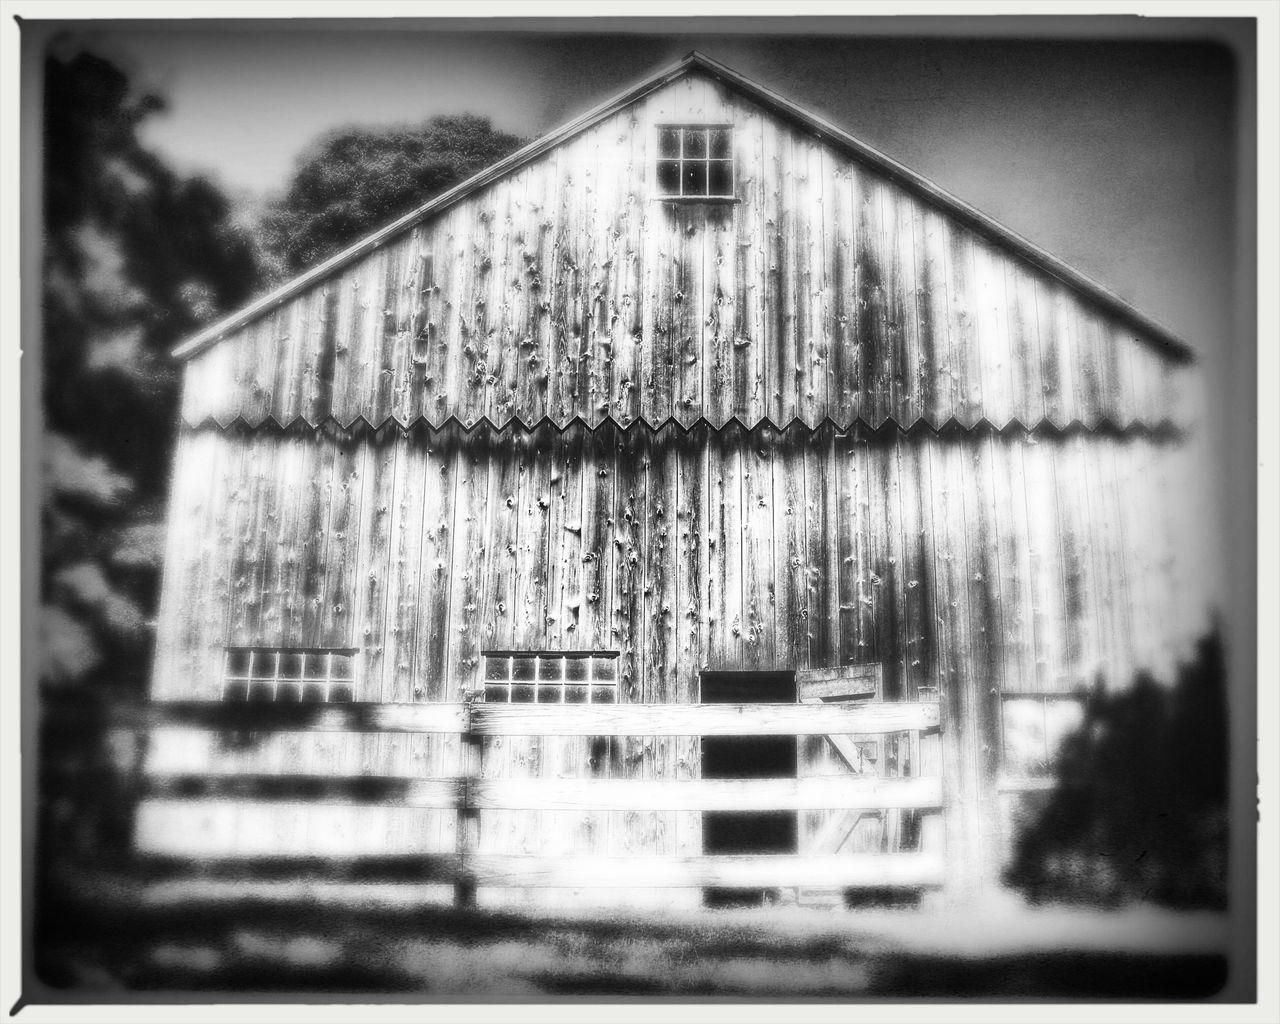 Barn Vintage Rural Farm Decay Moody Black And White Monochrome Grey Rural Landscape Melancholic Landscapes Noir